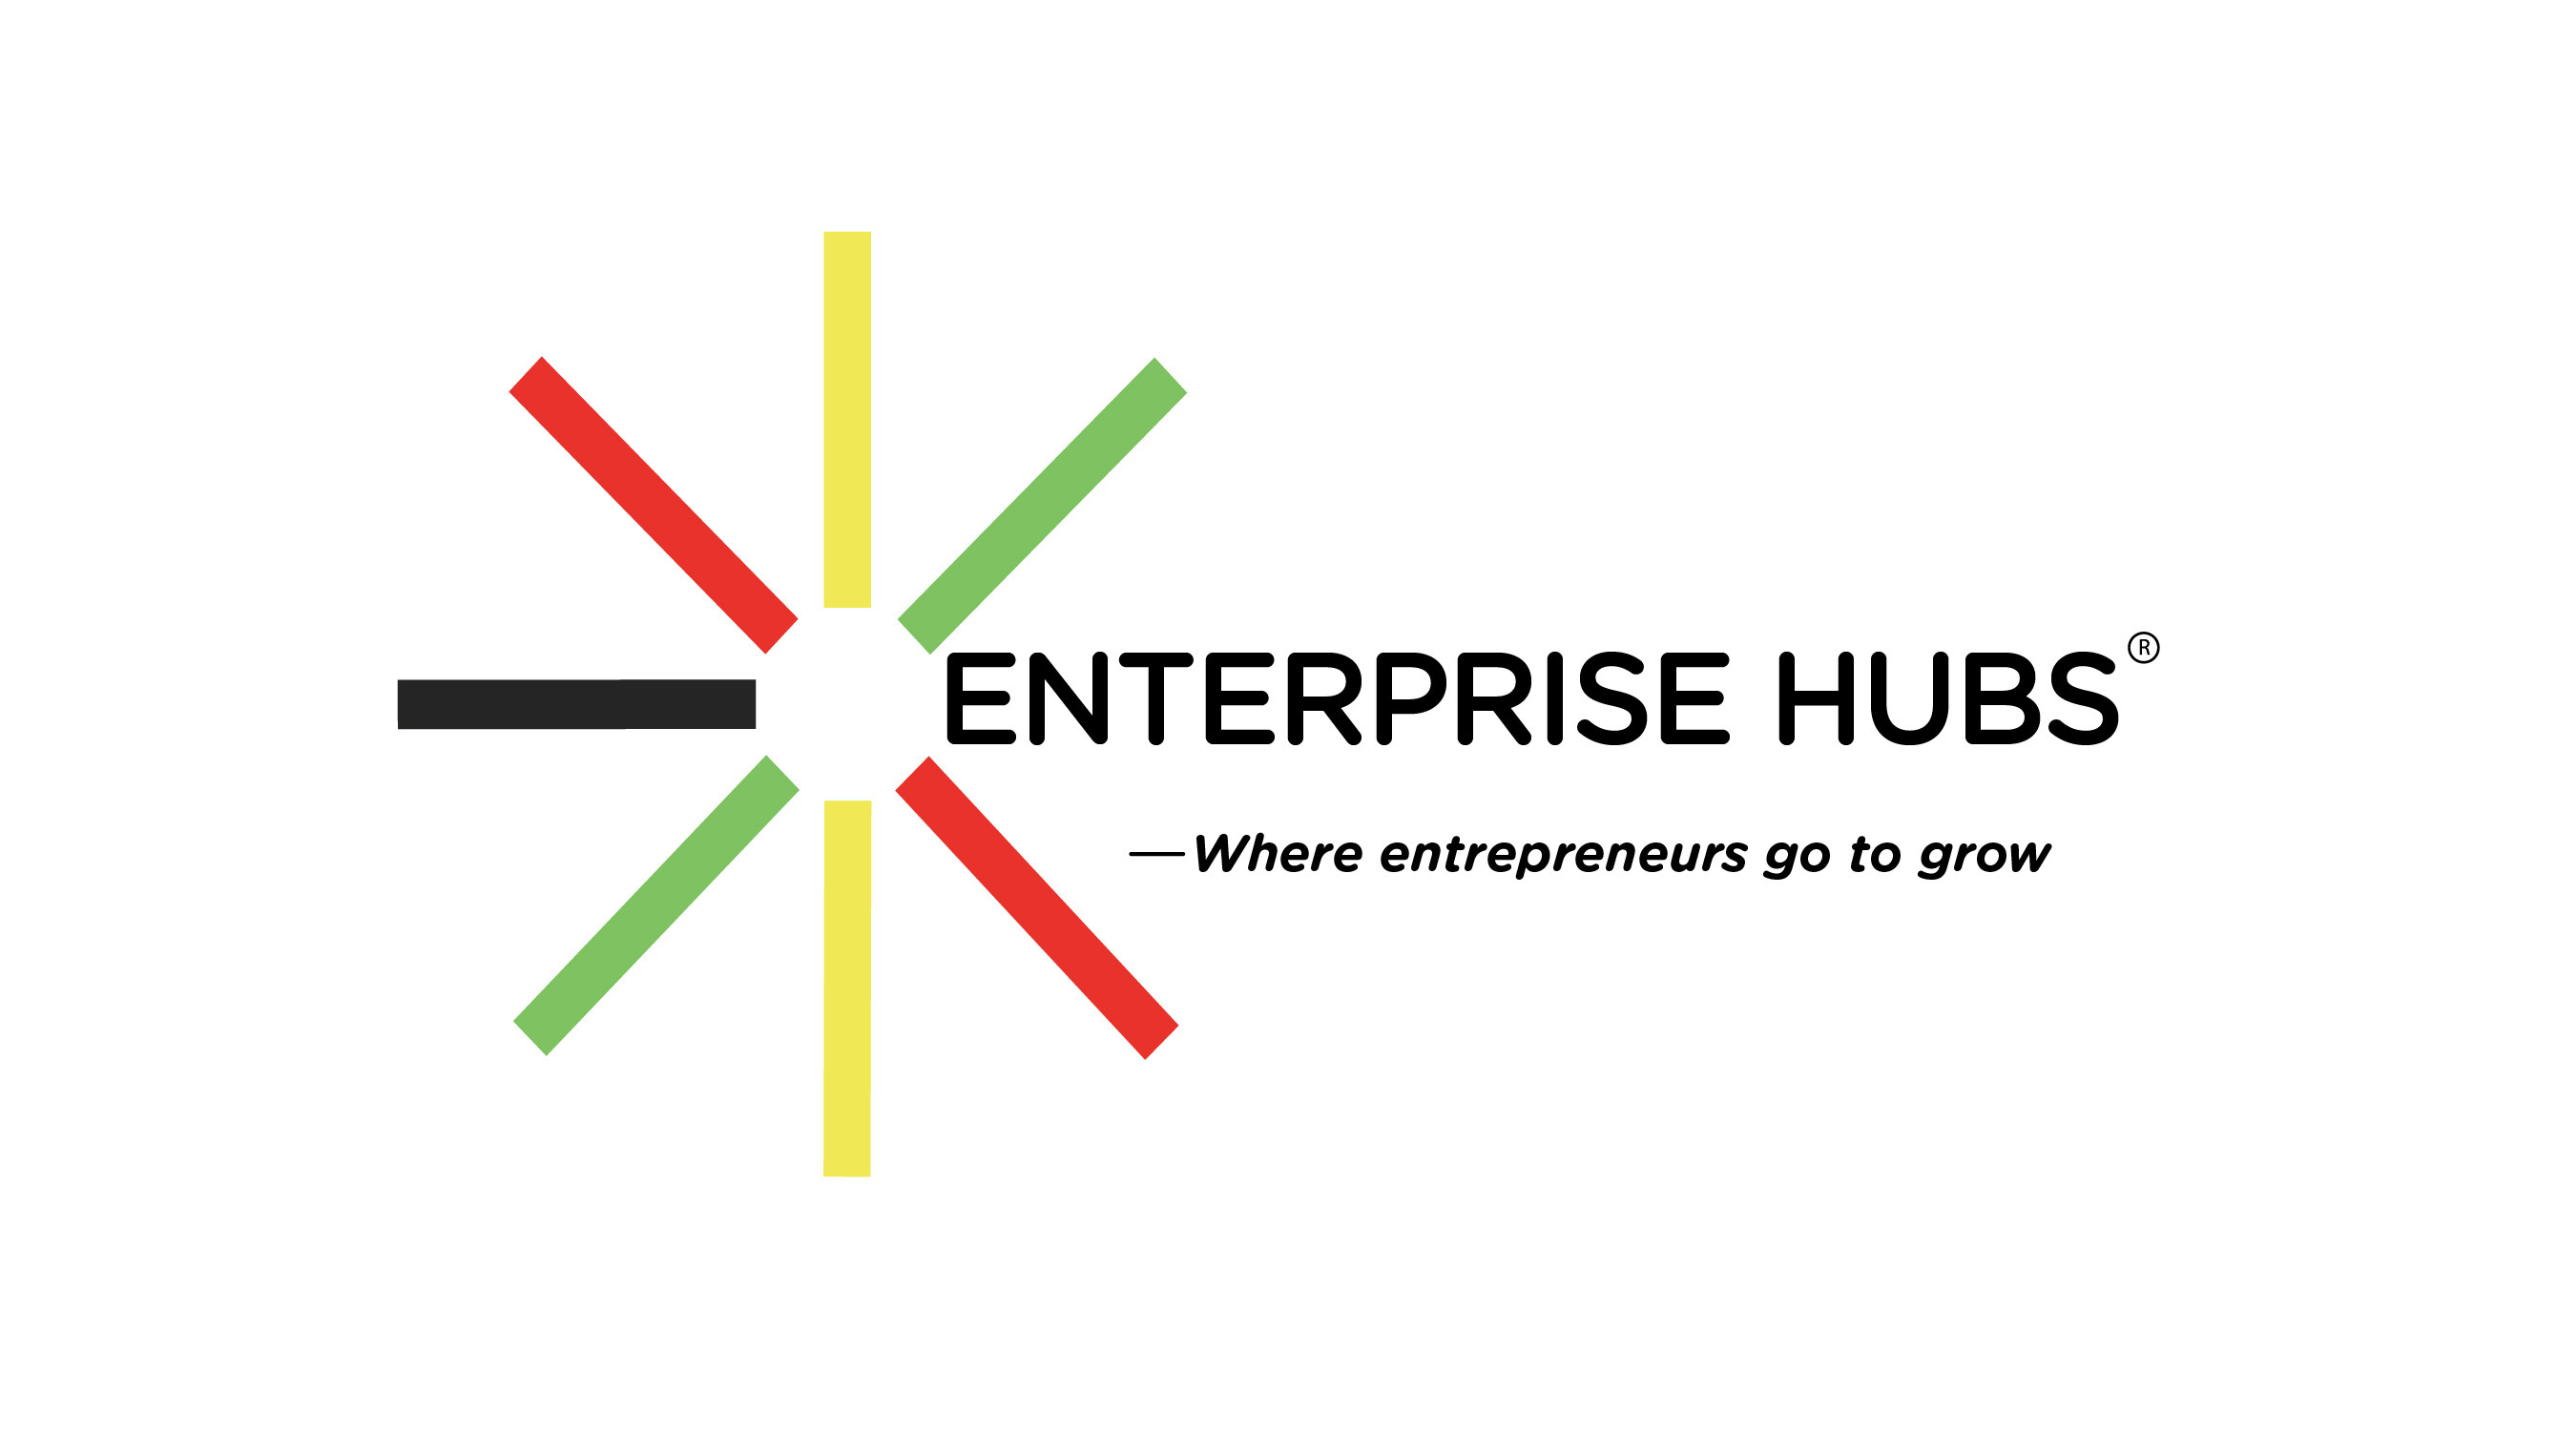 Enterprise Hubs